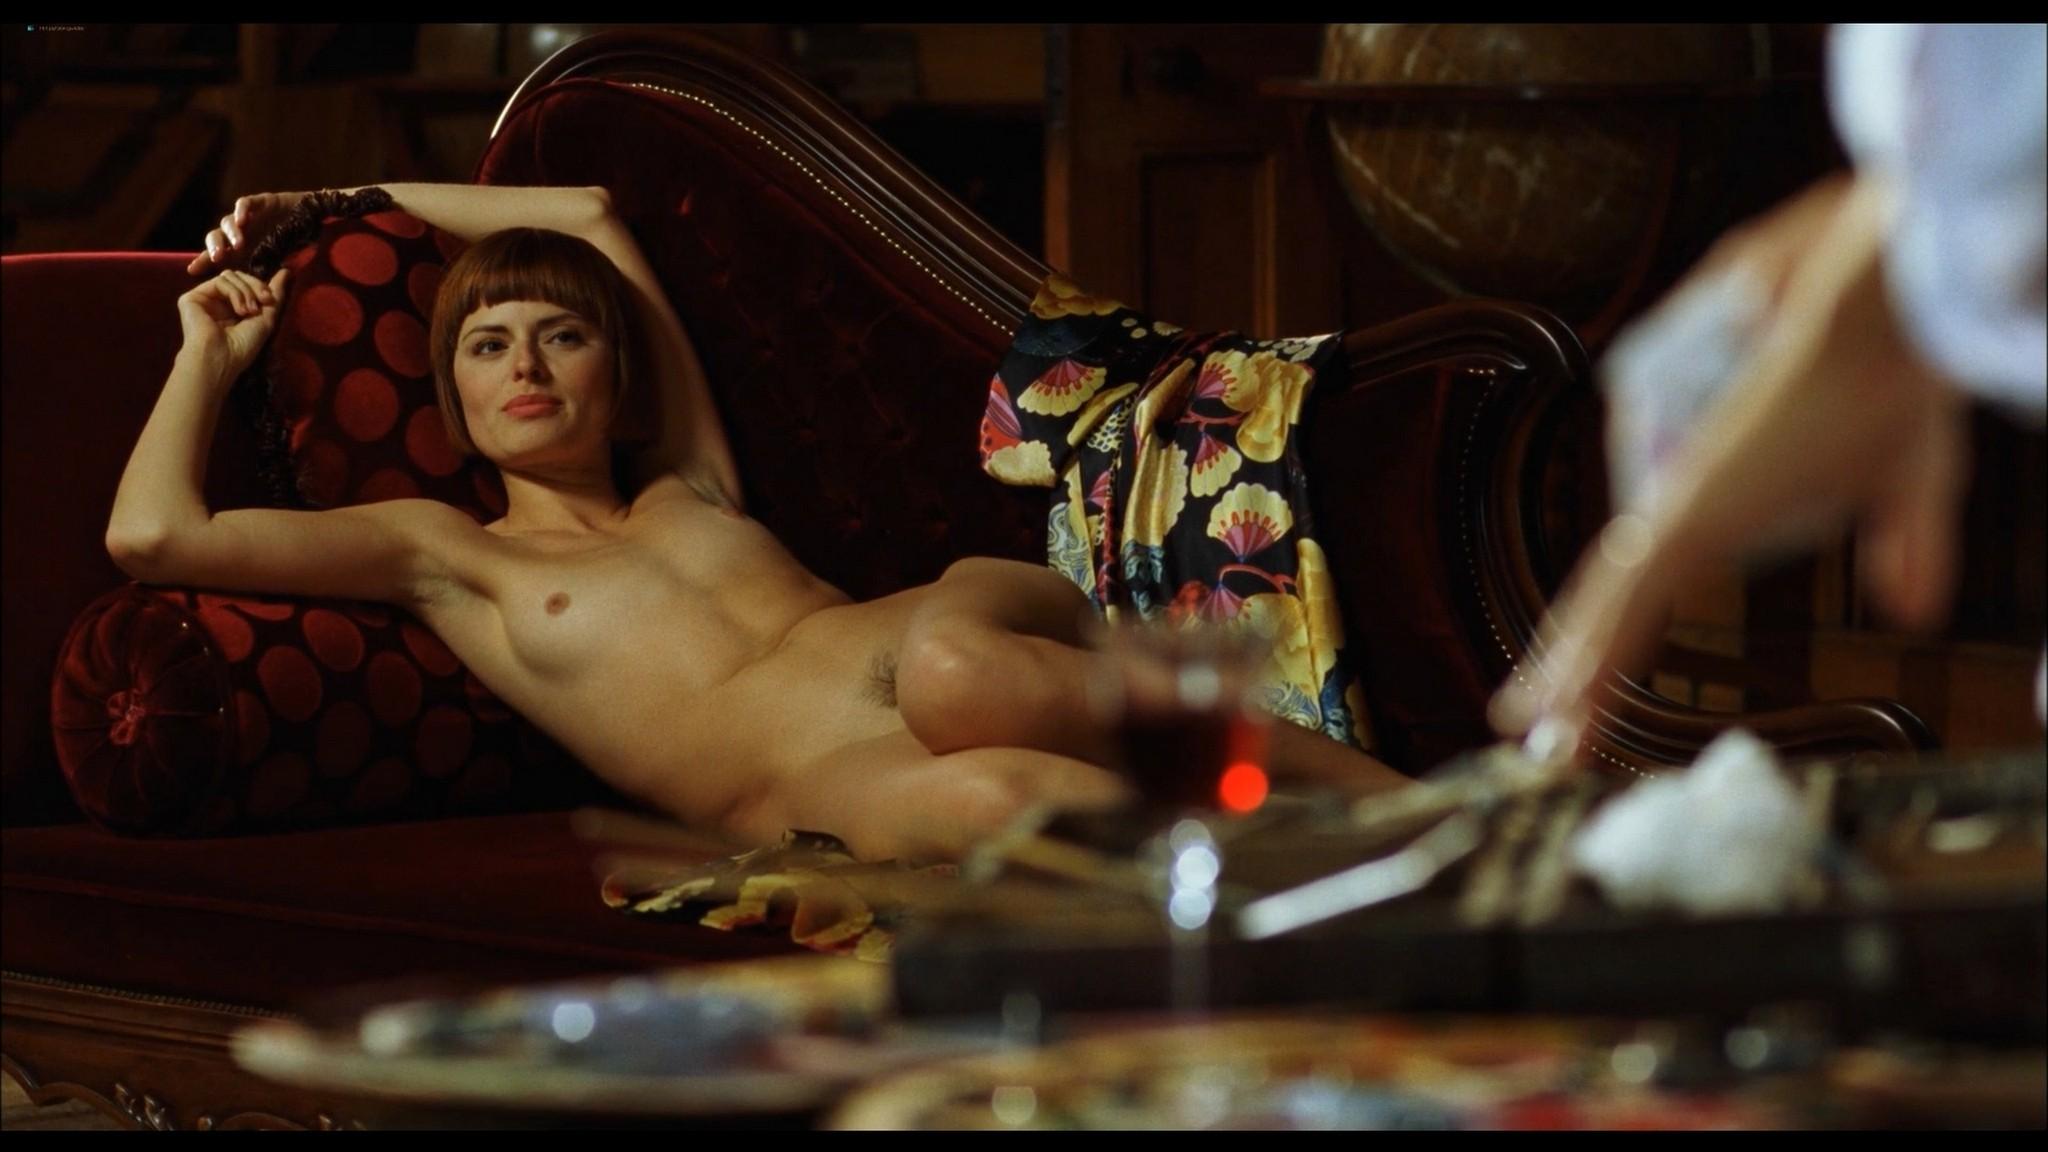 Avalon Barrie nude and Lyudmila Shiryaeva nude full frontal Sappho 2008 HD 1080p BluRay REMUX 23